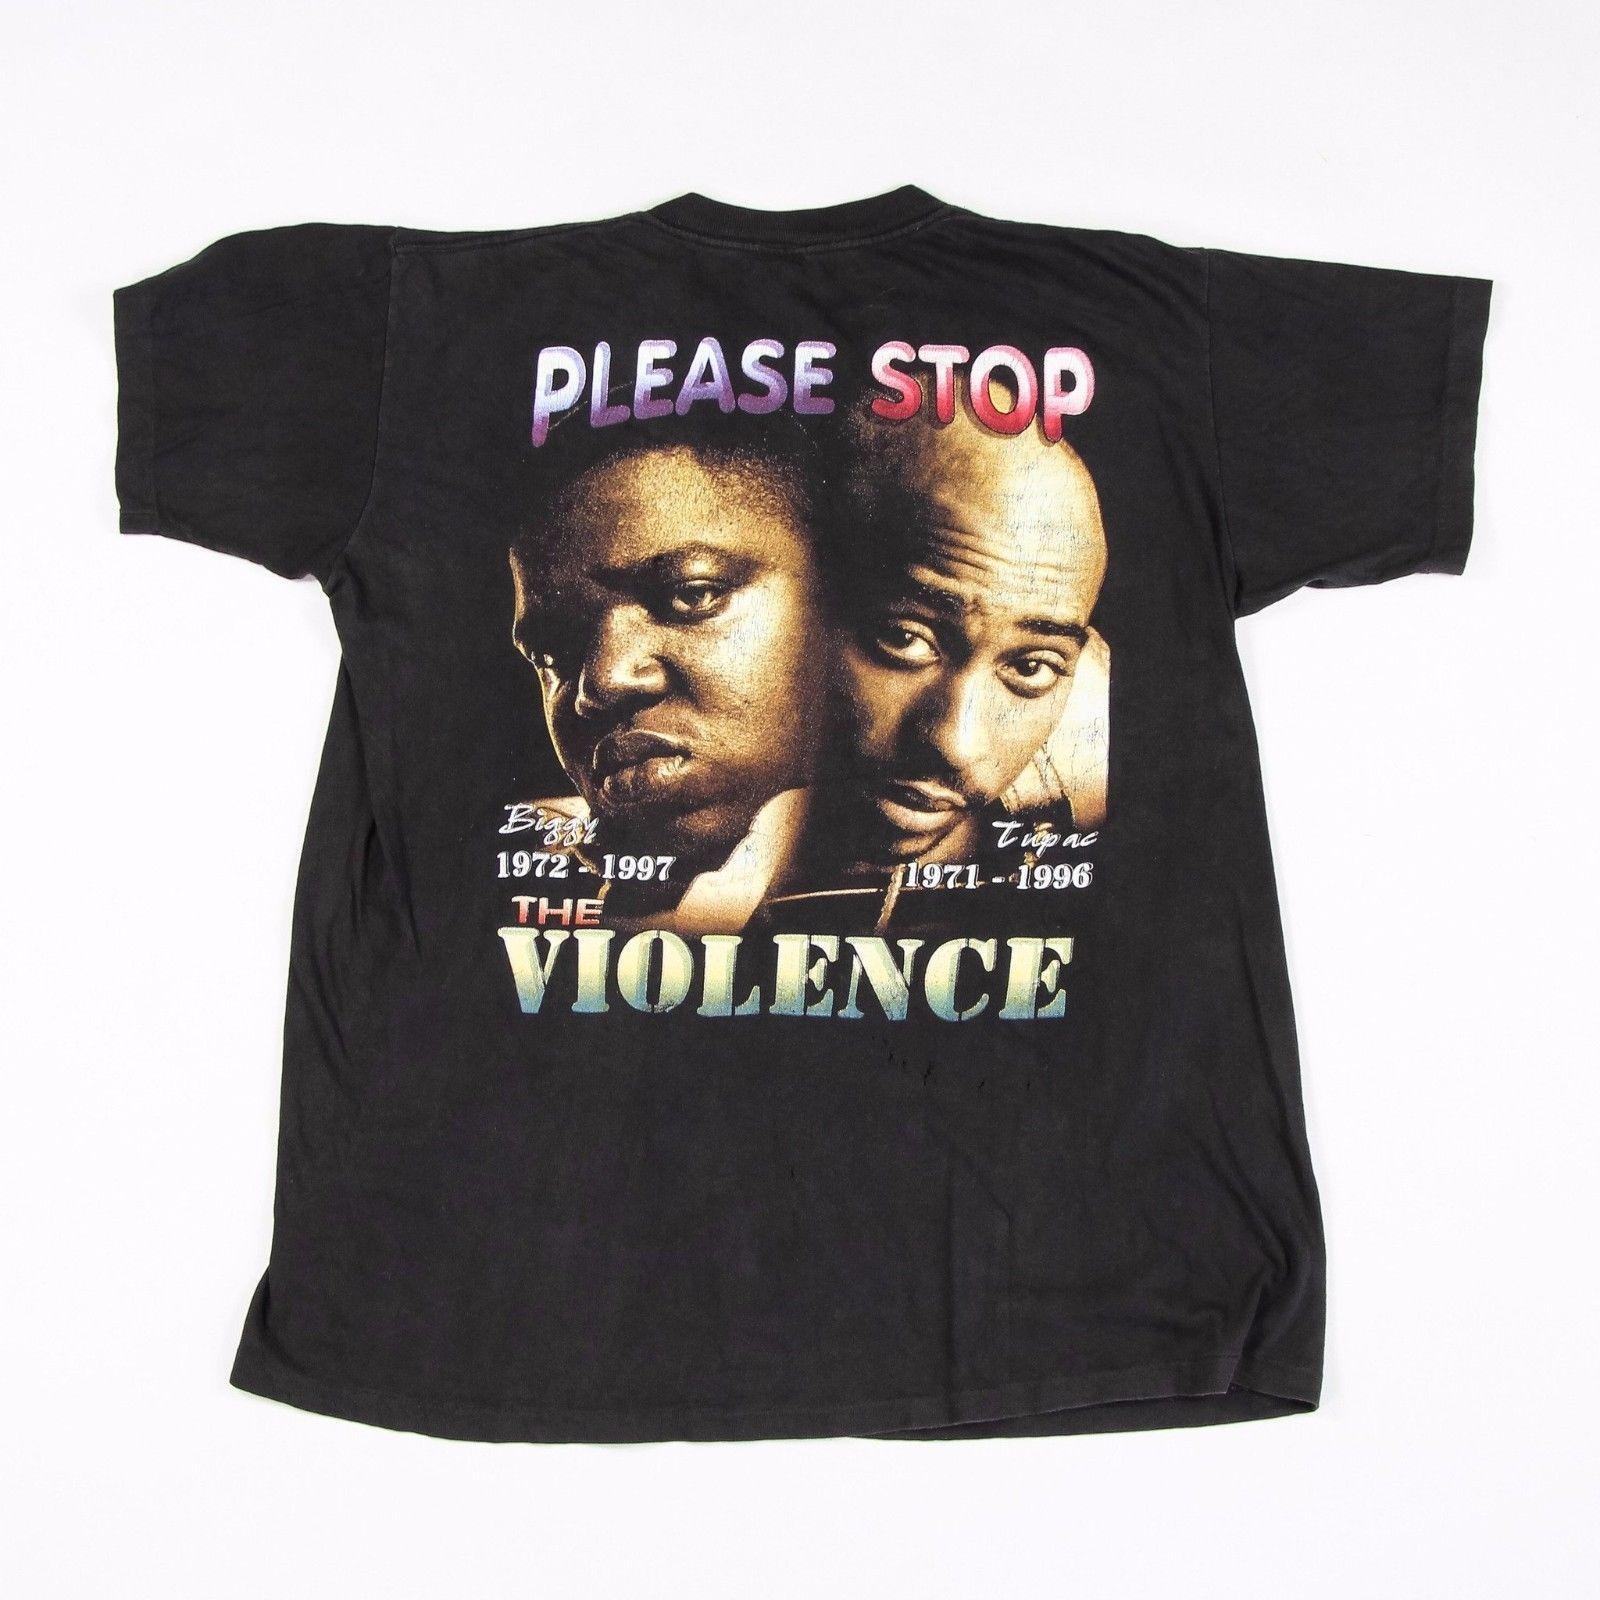 2pac t shirt ebay